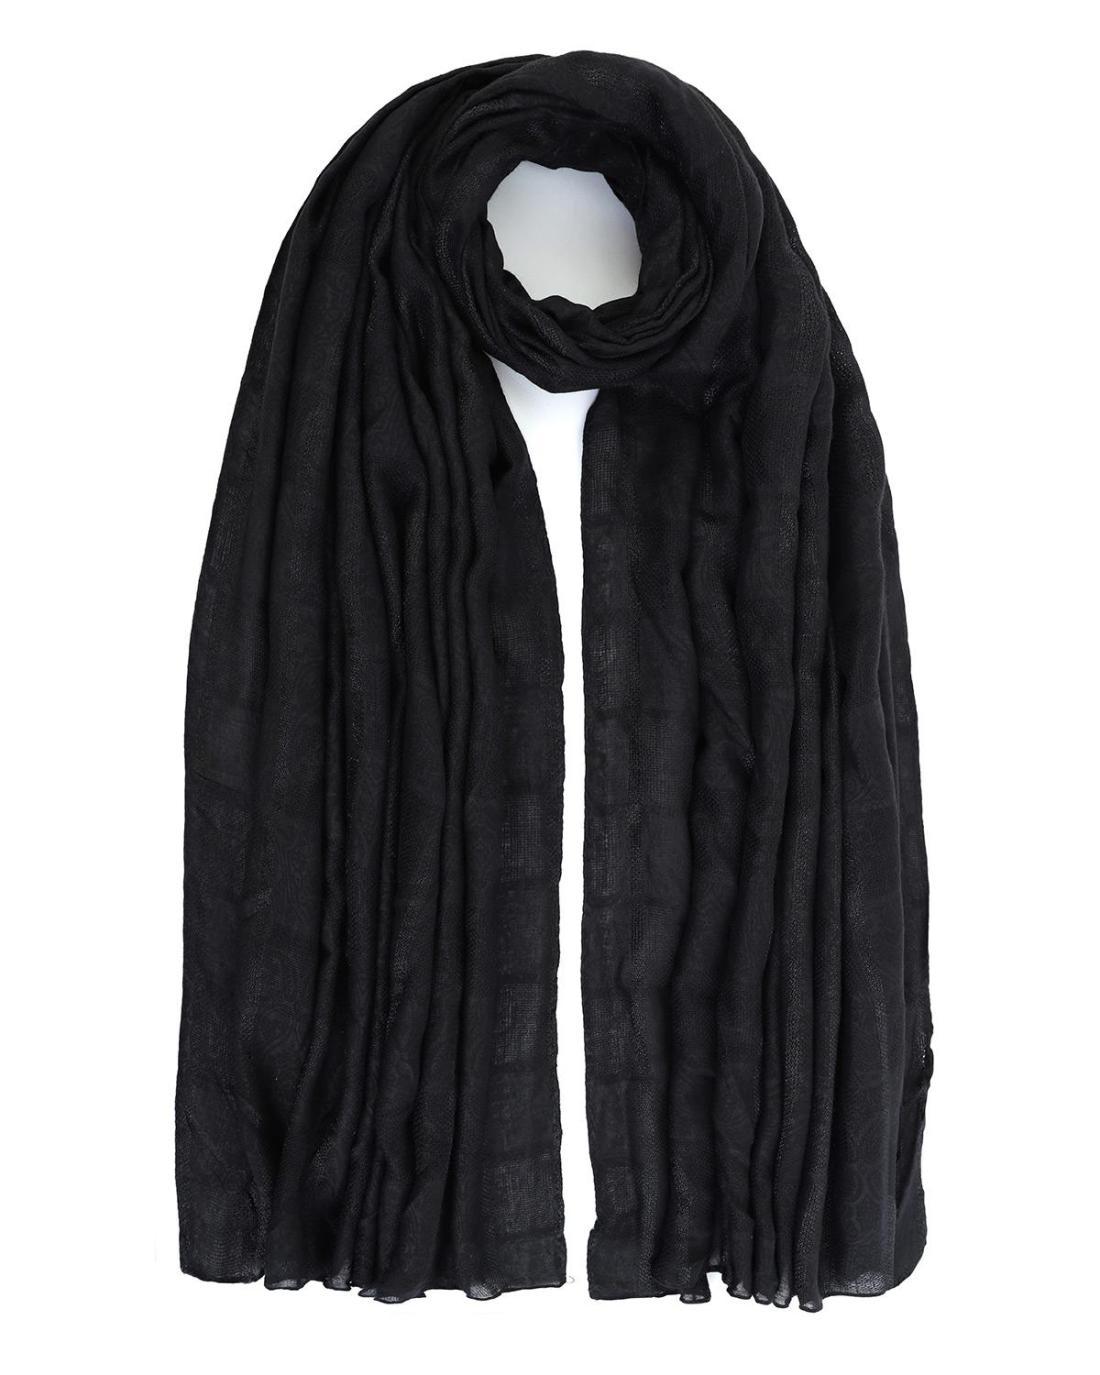 Foulard-Tücher schwarz